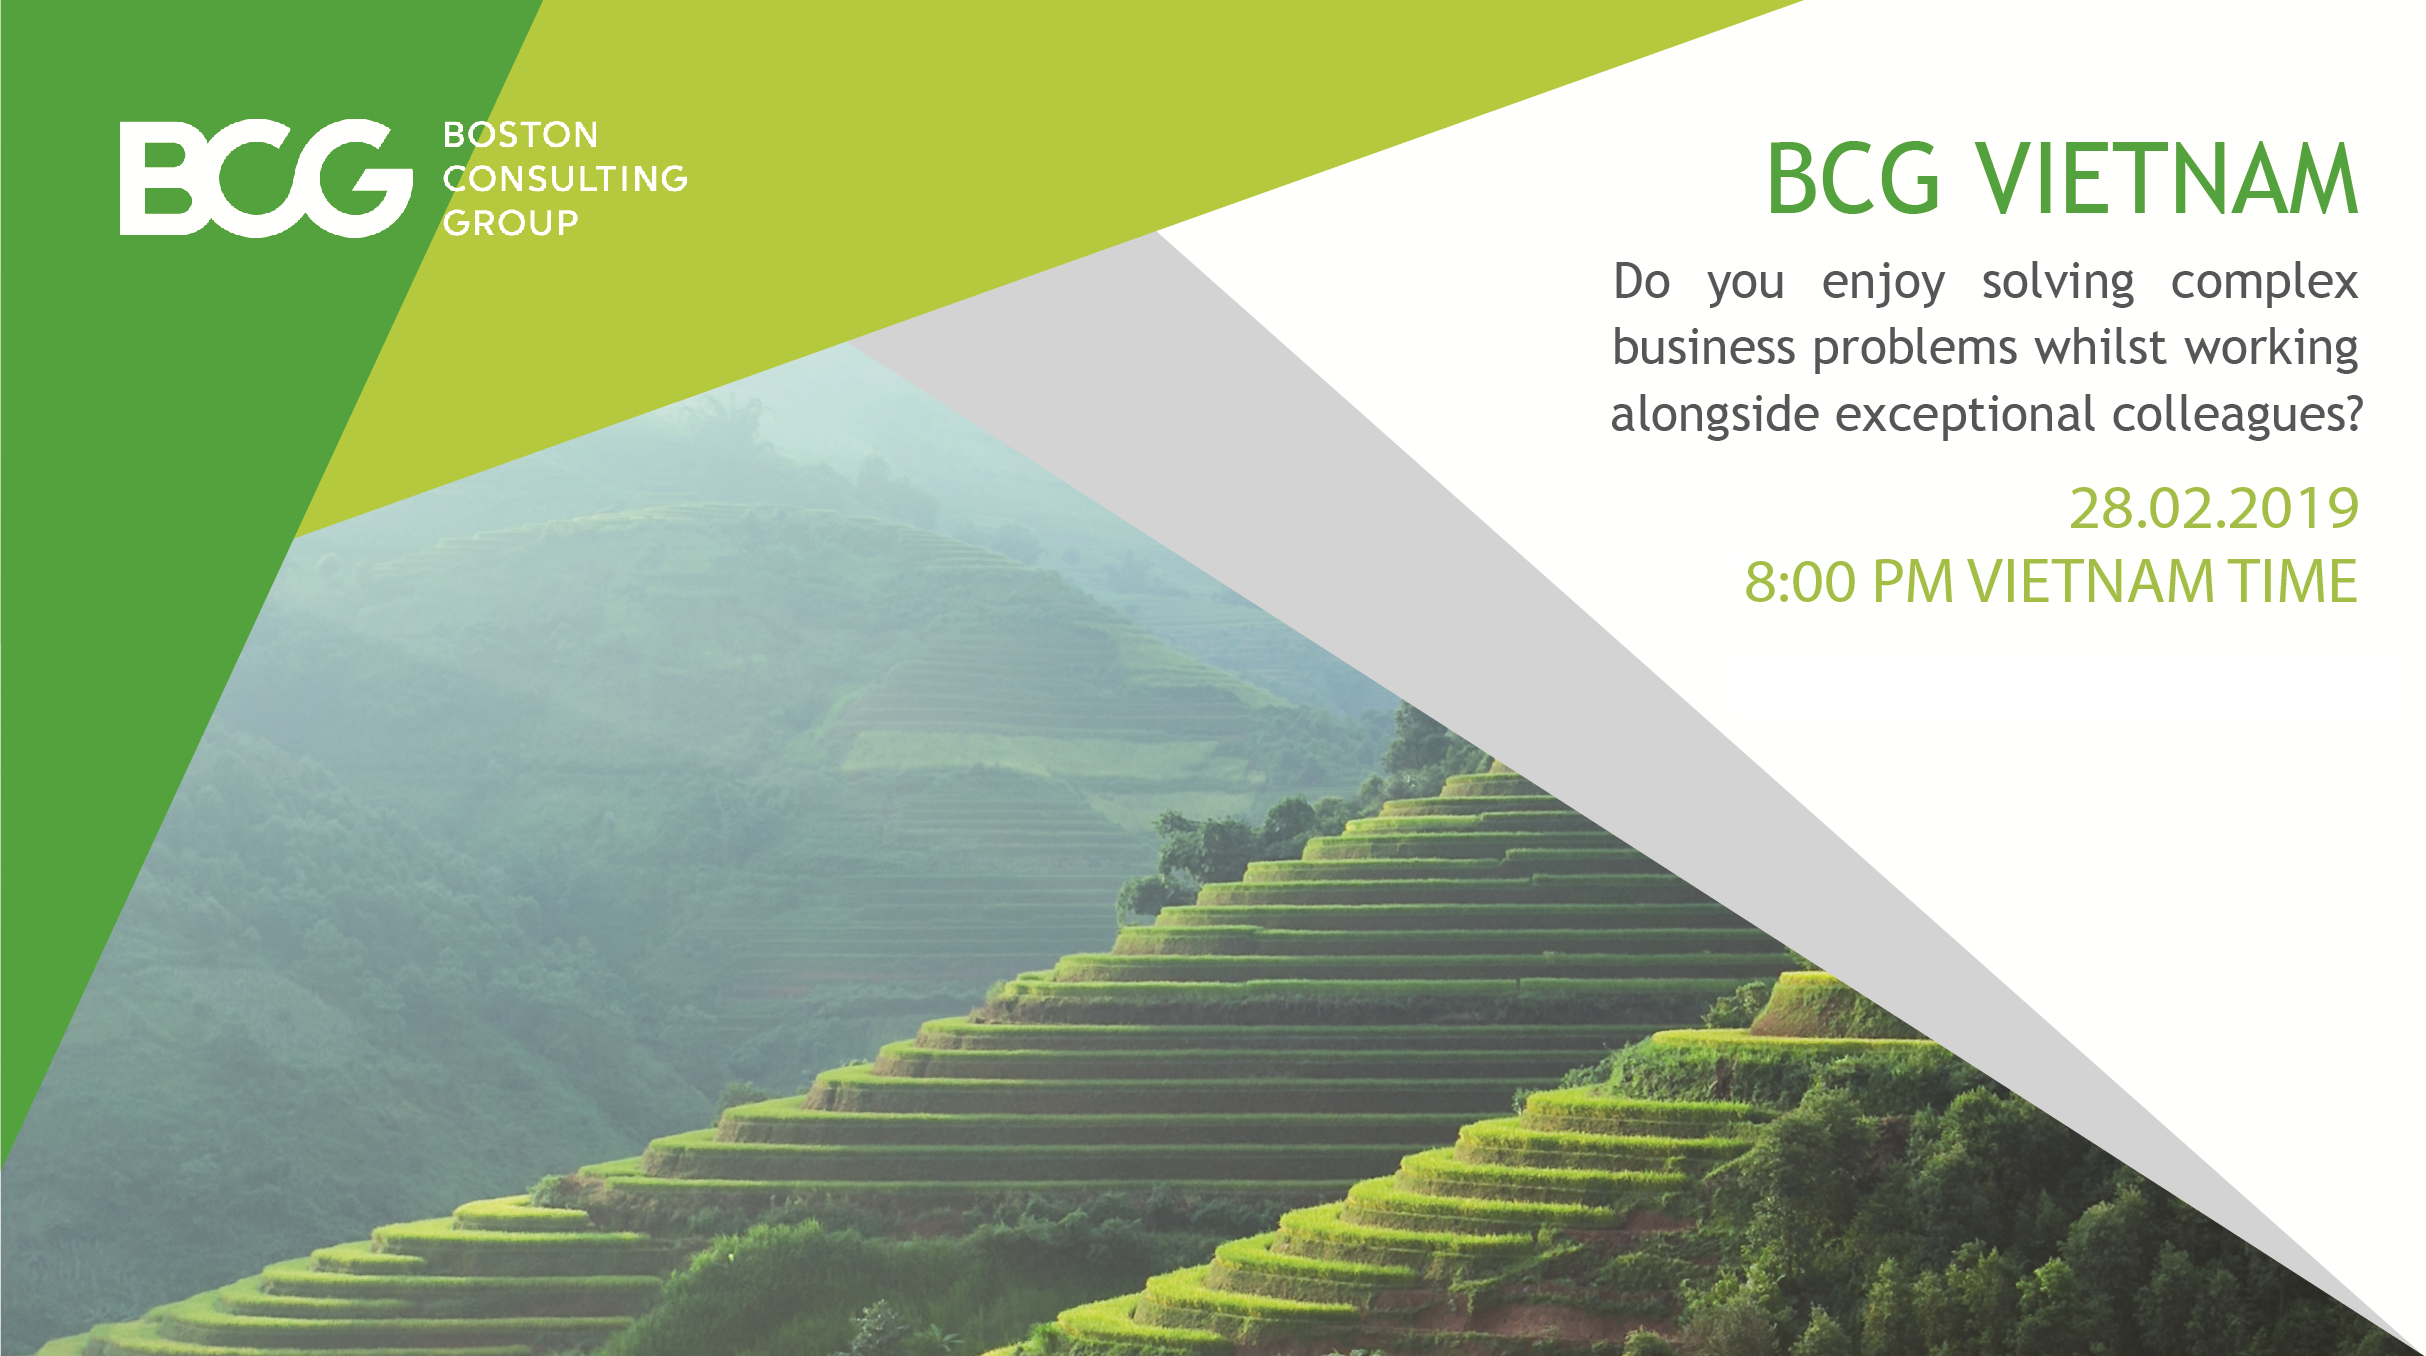 BCG Vietnam Webinar Connection Event. February 28, 2019.